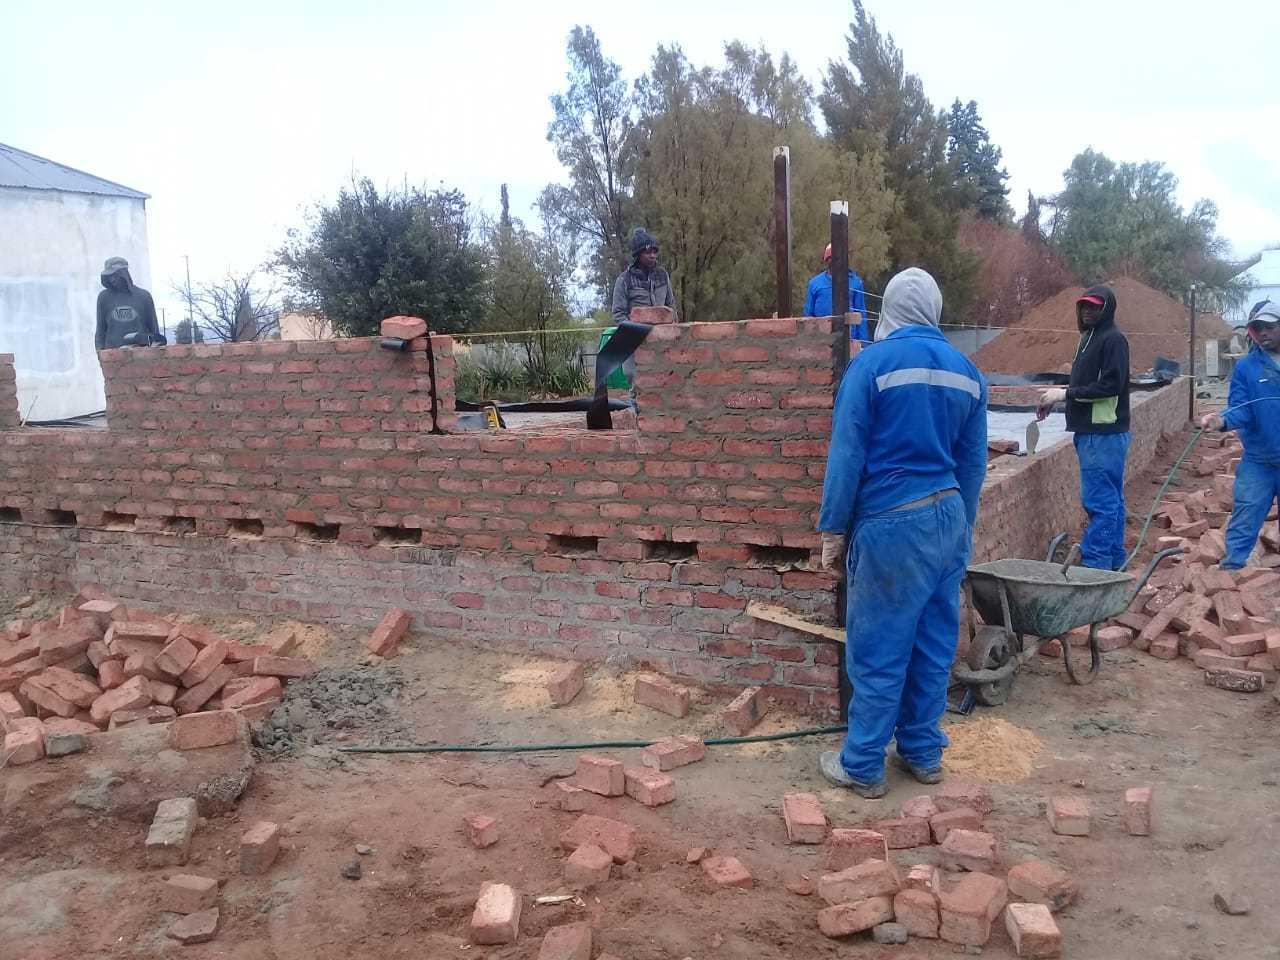 Foreman Construction Services